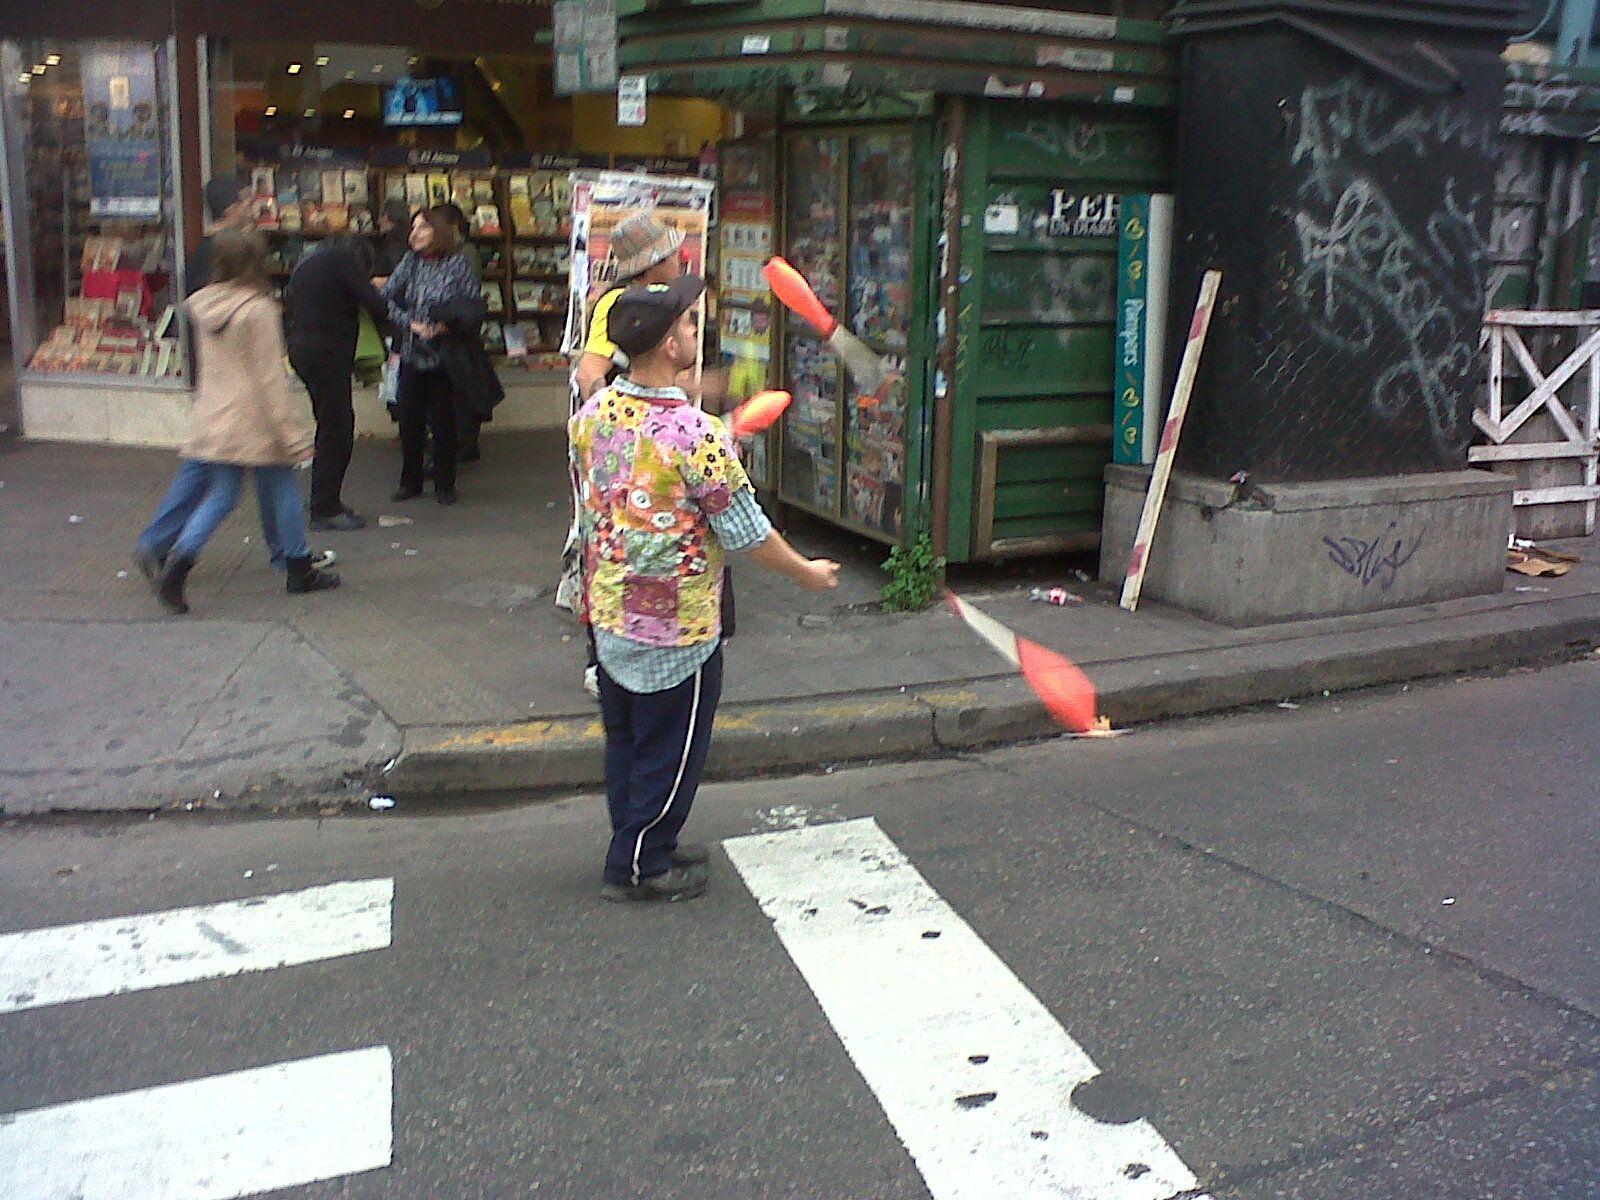 Juramento y Cabildo. Buenos Aires. Argentina.